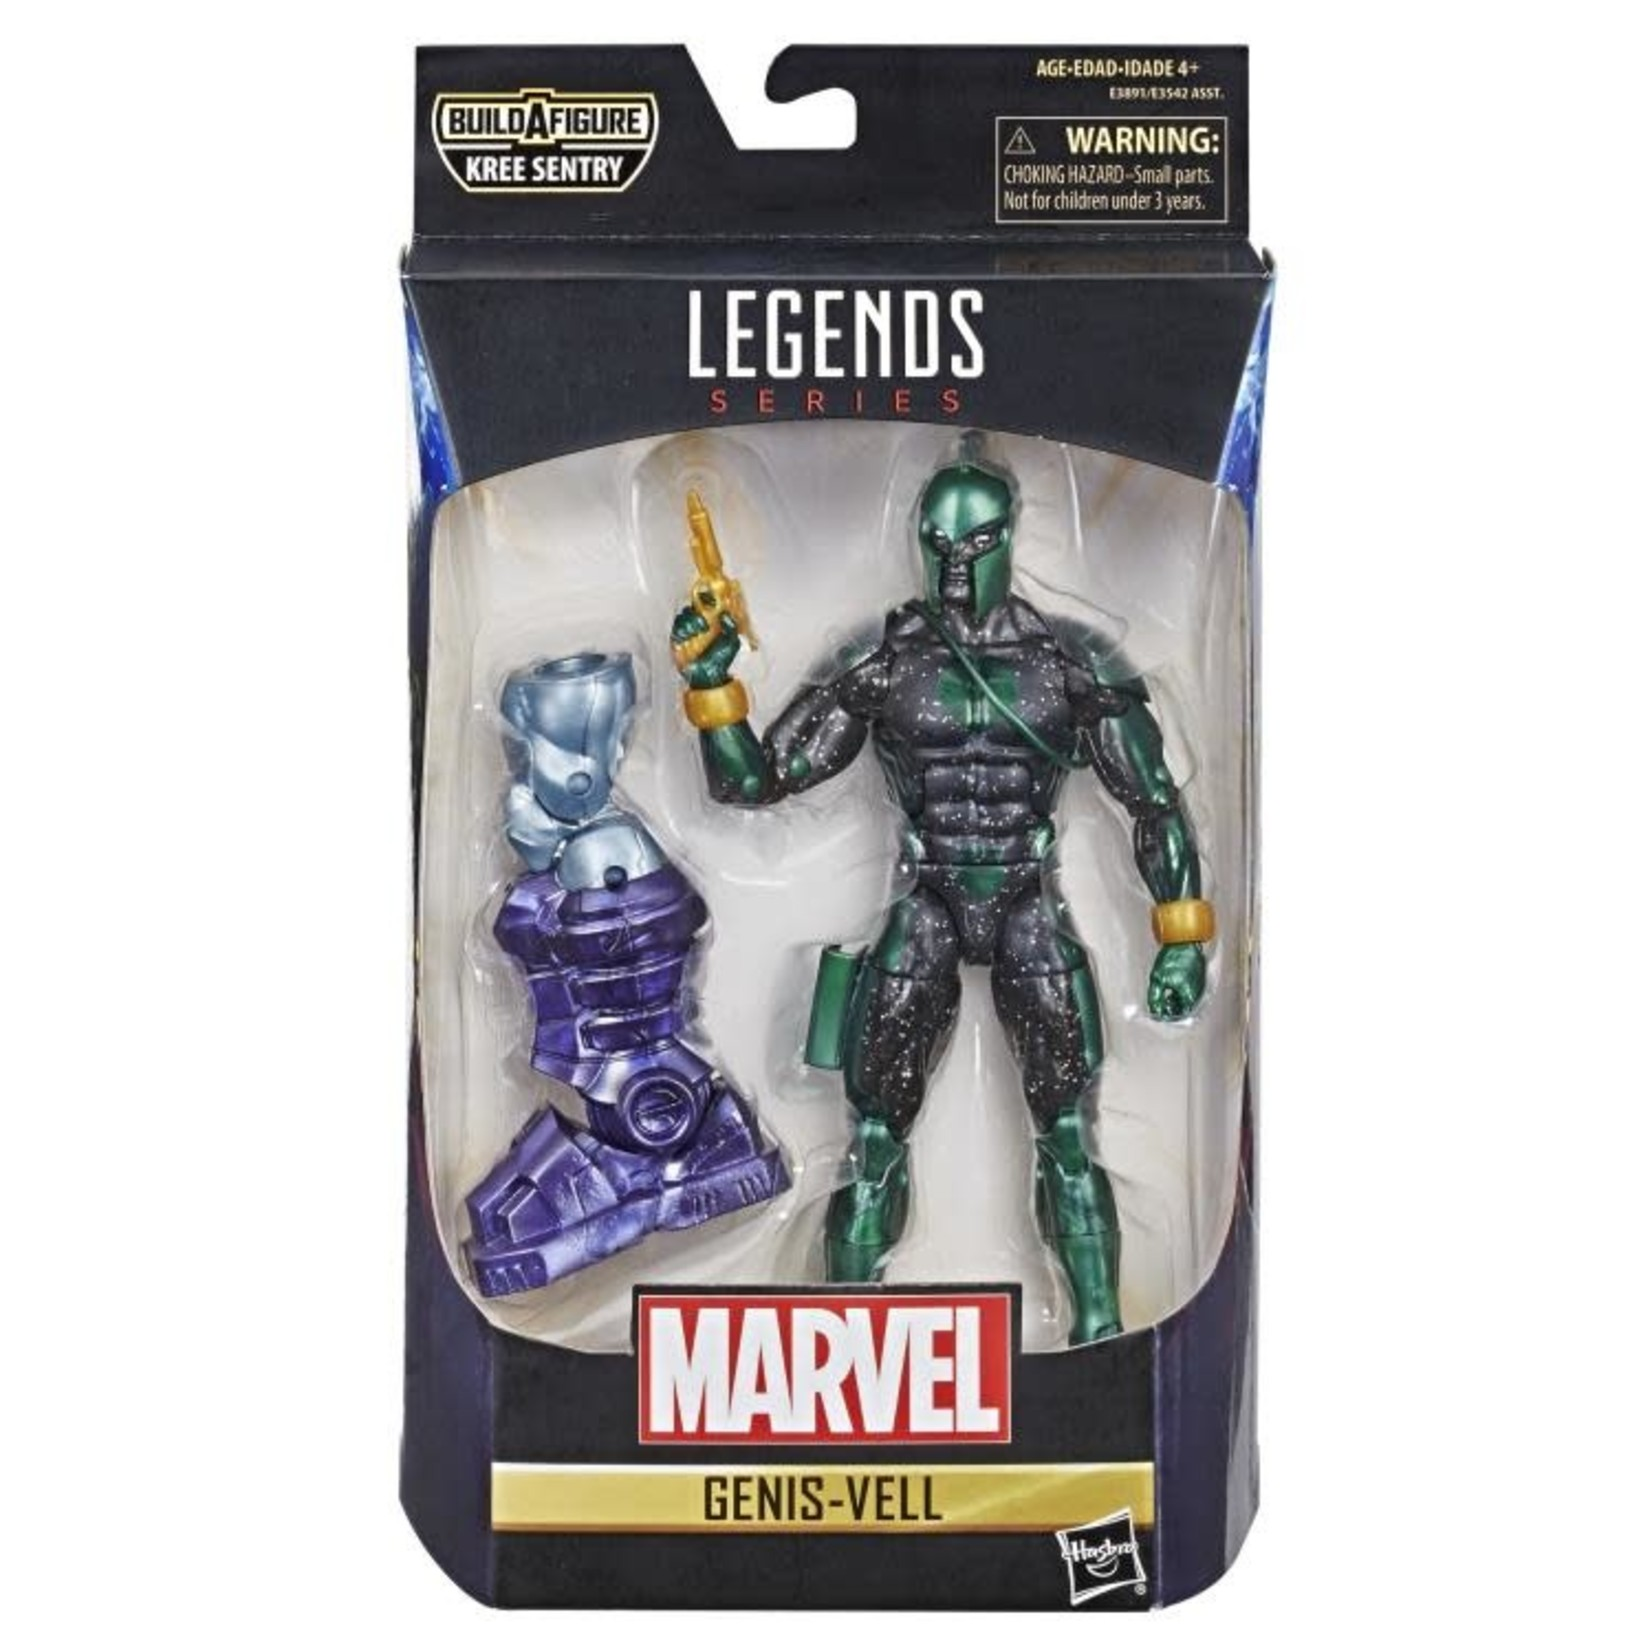 Hasbro Marvel Legends Captain Marvel Kree Sentry BAF - Genis-Vell